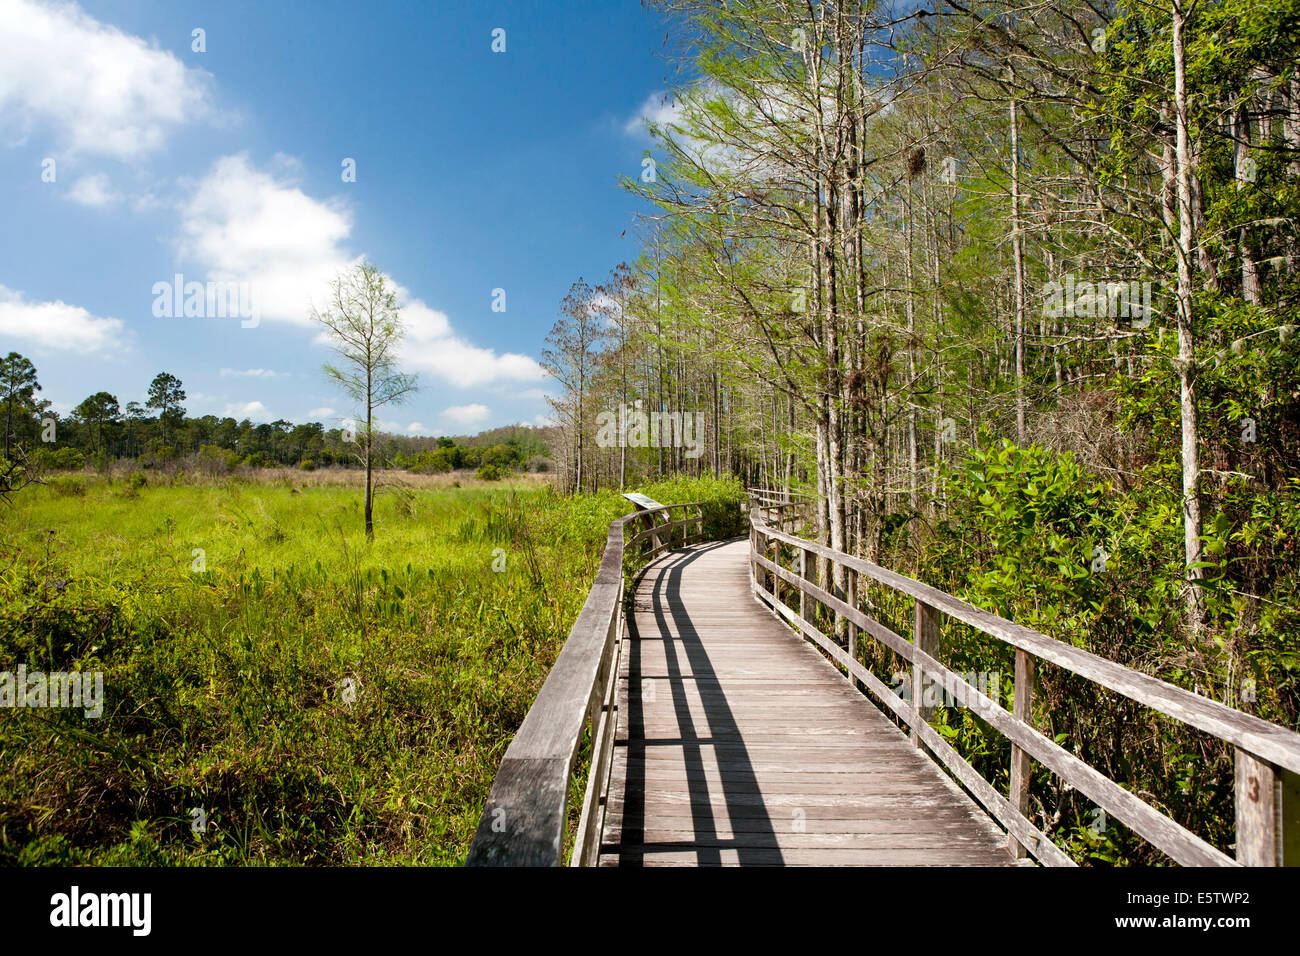 Boardwalk Trail at Corkscrew Swamp Sanctuary - near Namples, Florida USA - Stock Image